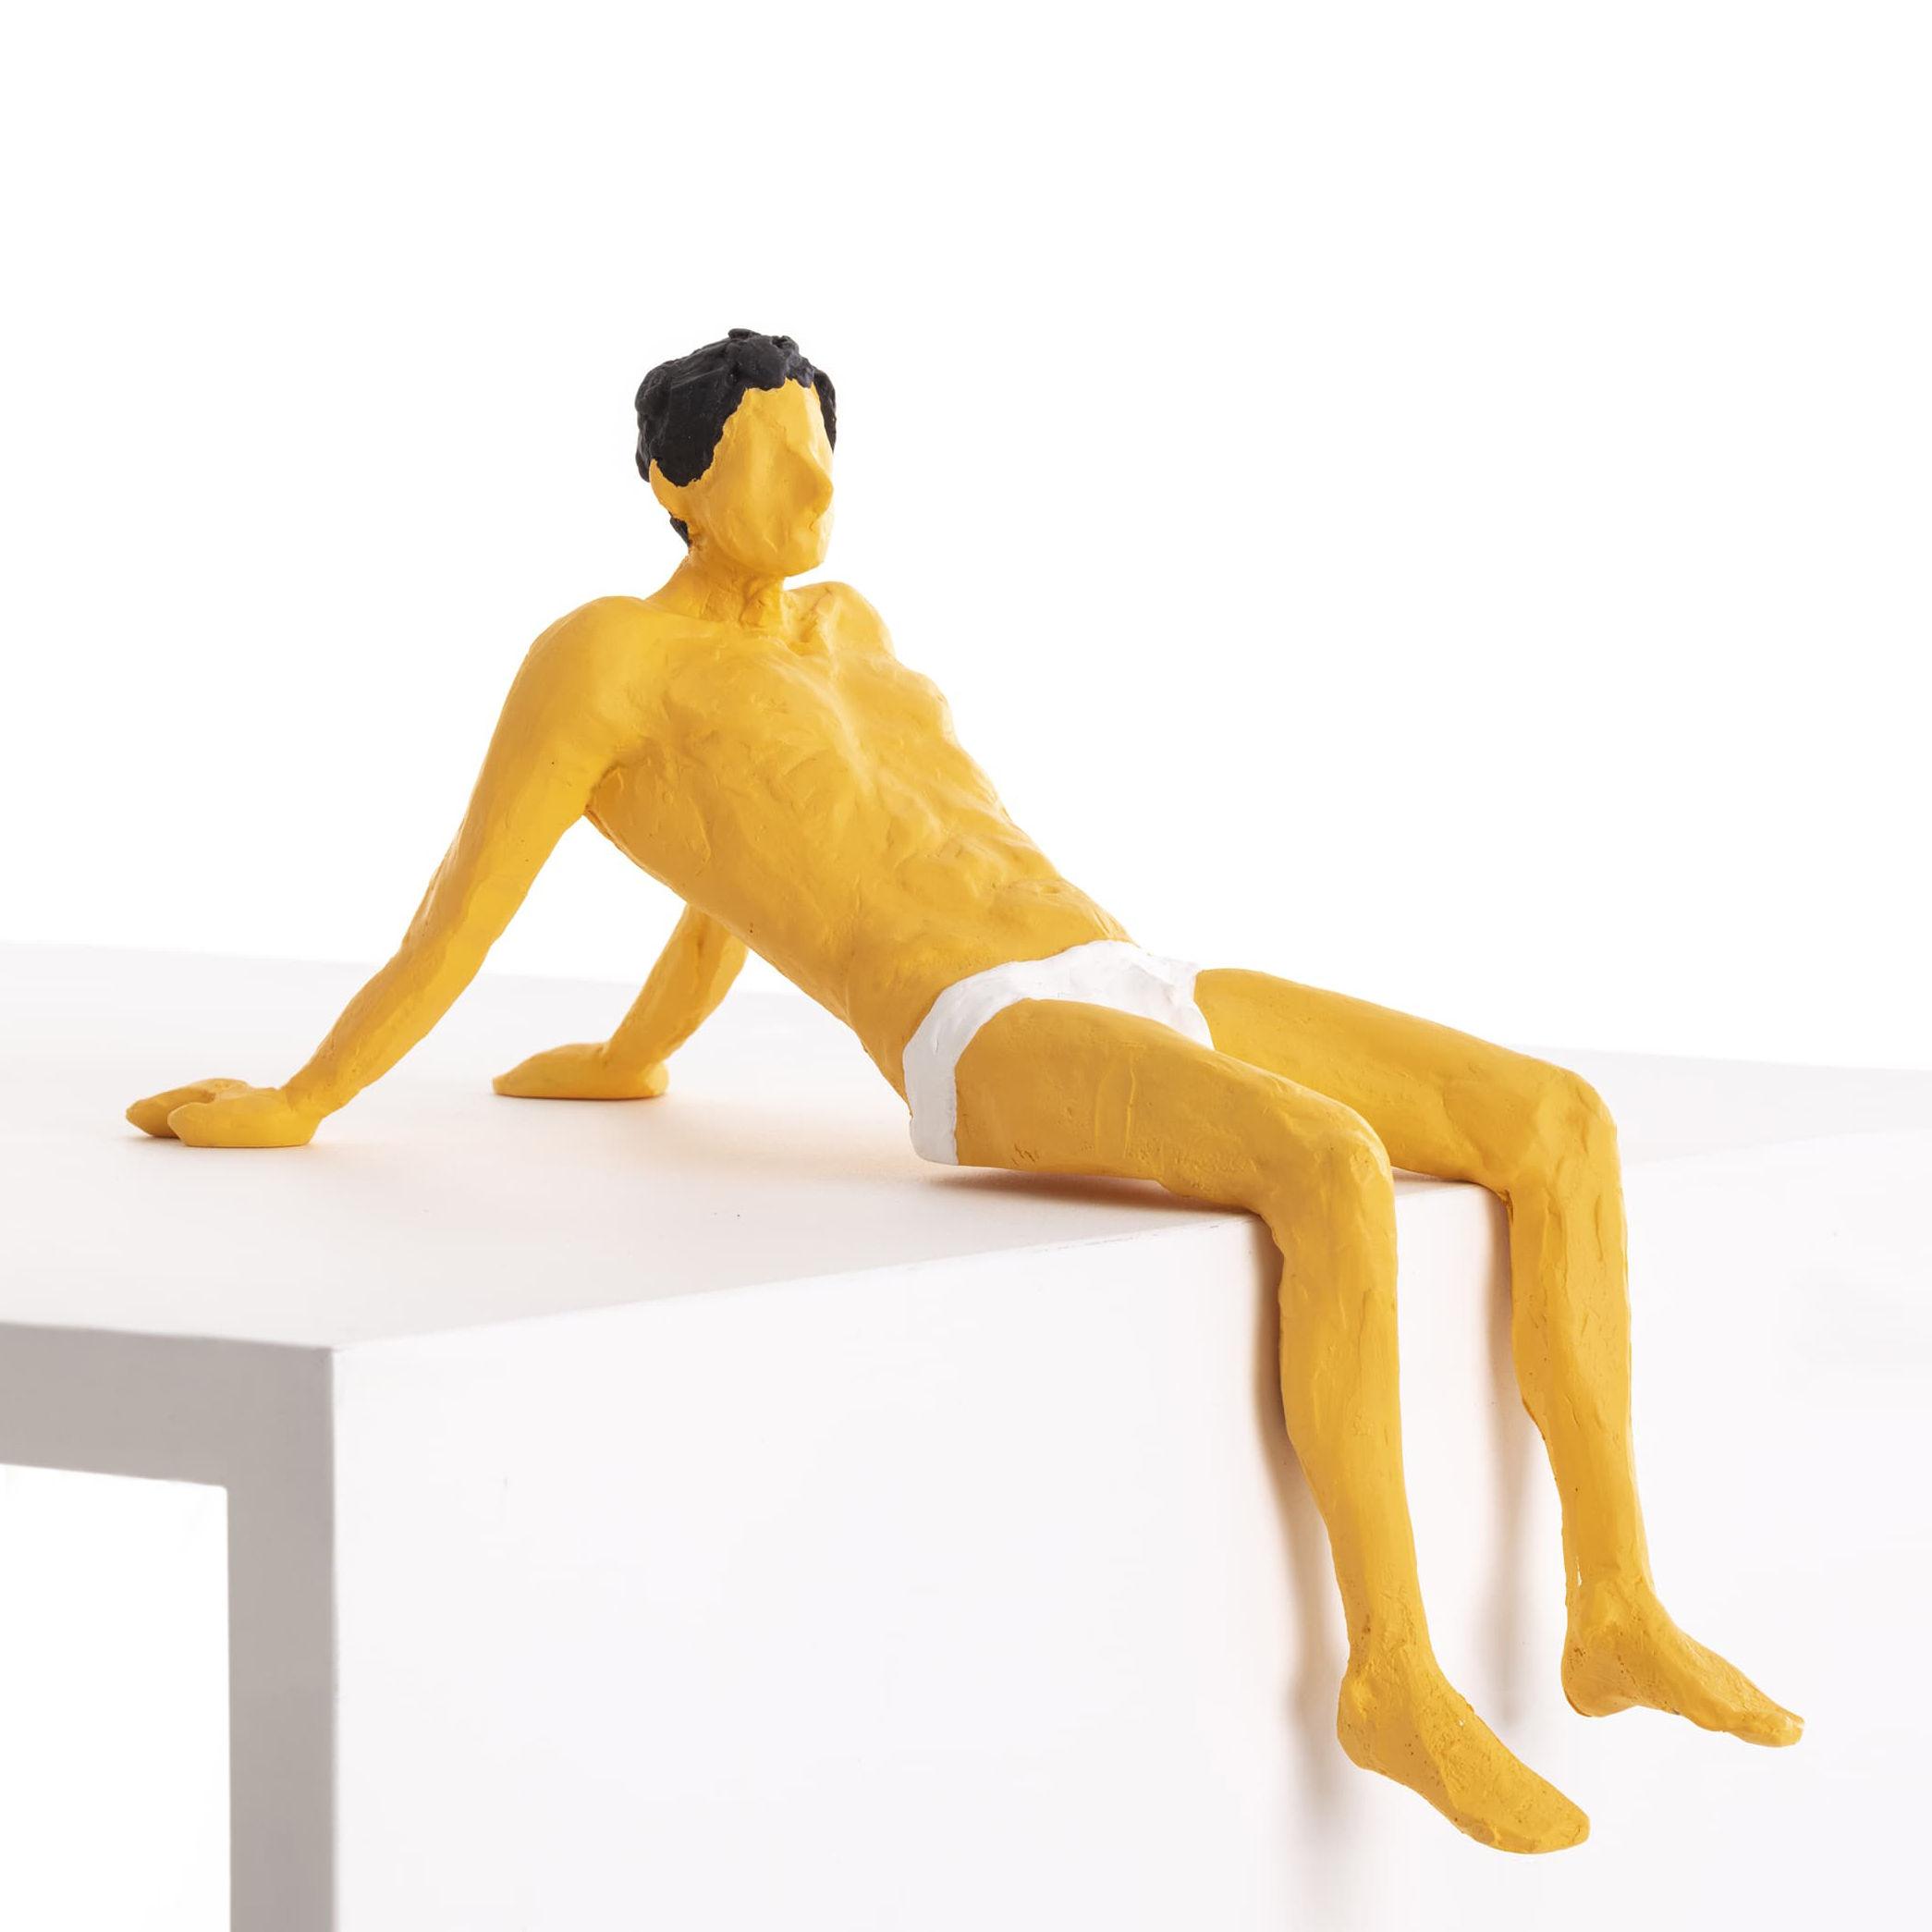 Dekoration - Dekorationsartikel - Love is a Verb Figur / Pierrot - Seletti - Pierrot - Harz